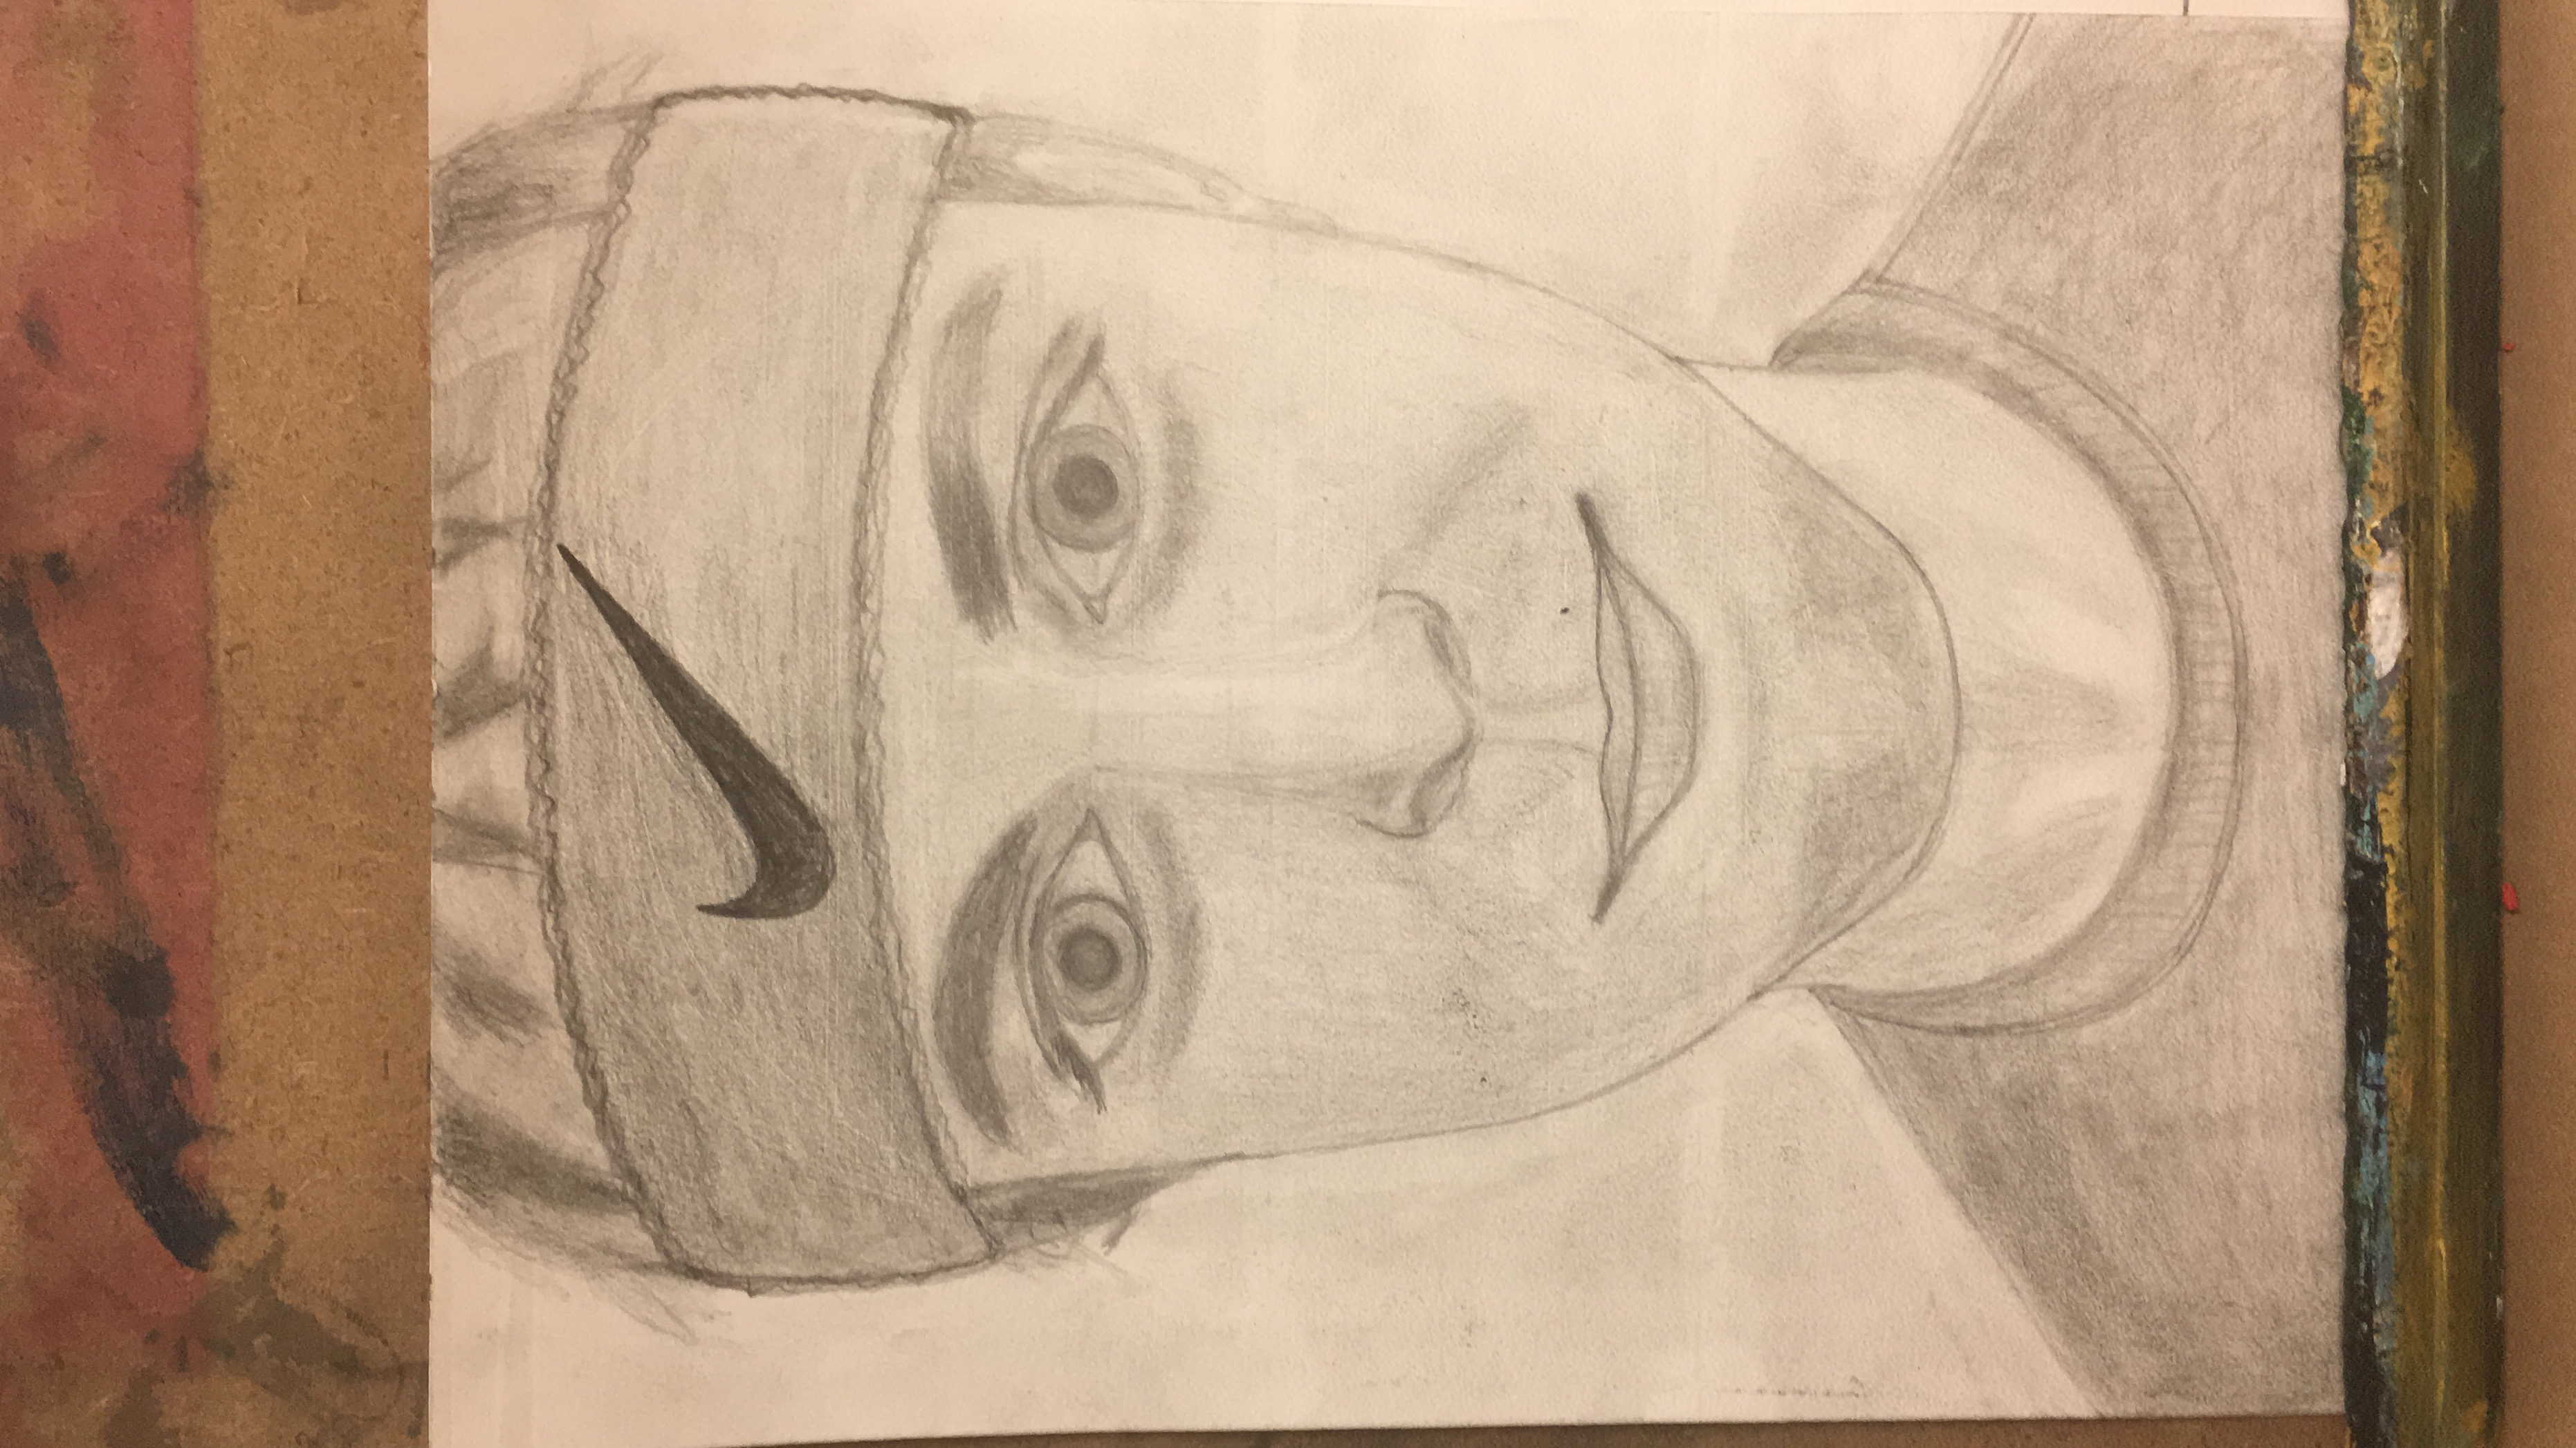 Zandrew's Self Portrait